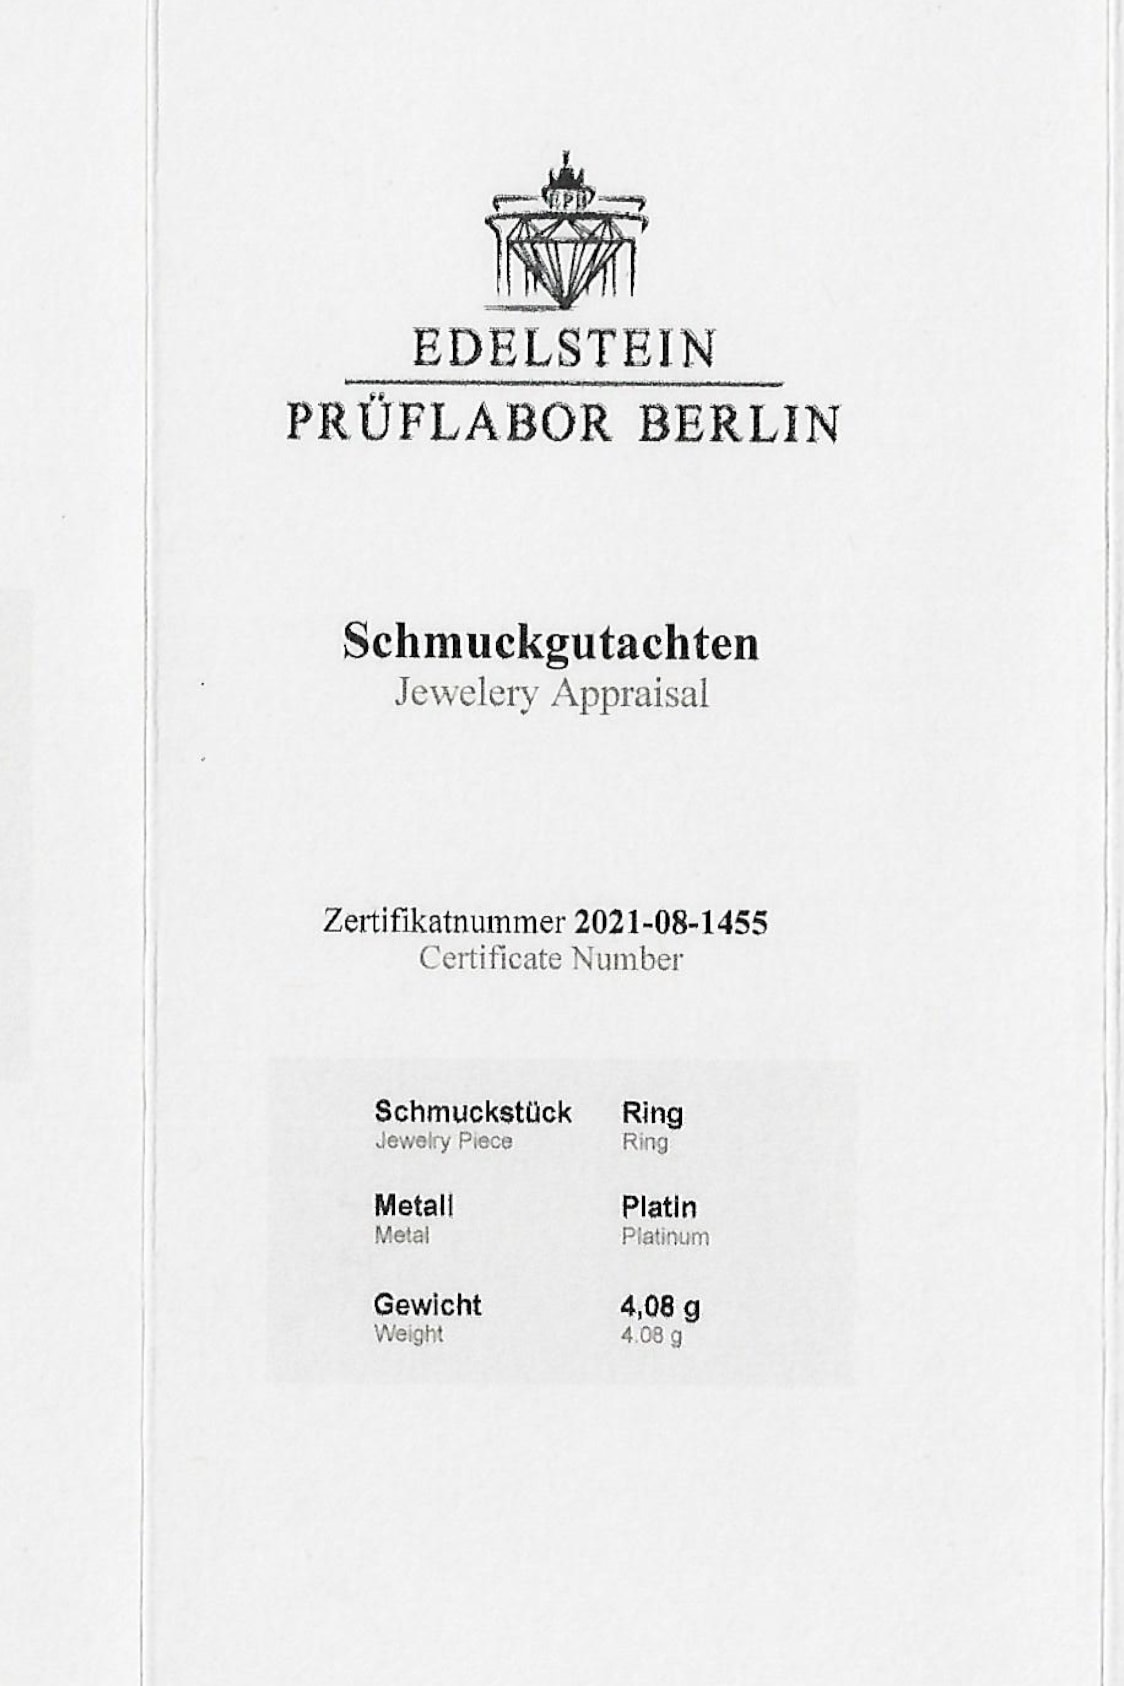 1008-Zertifikat-2